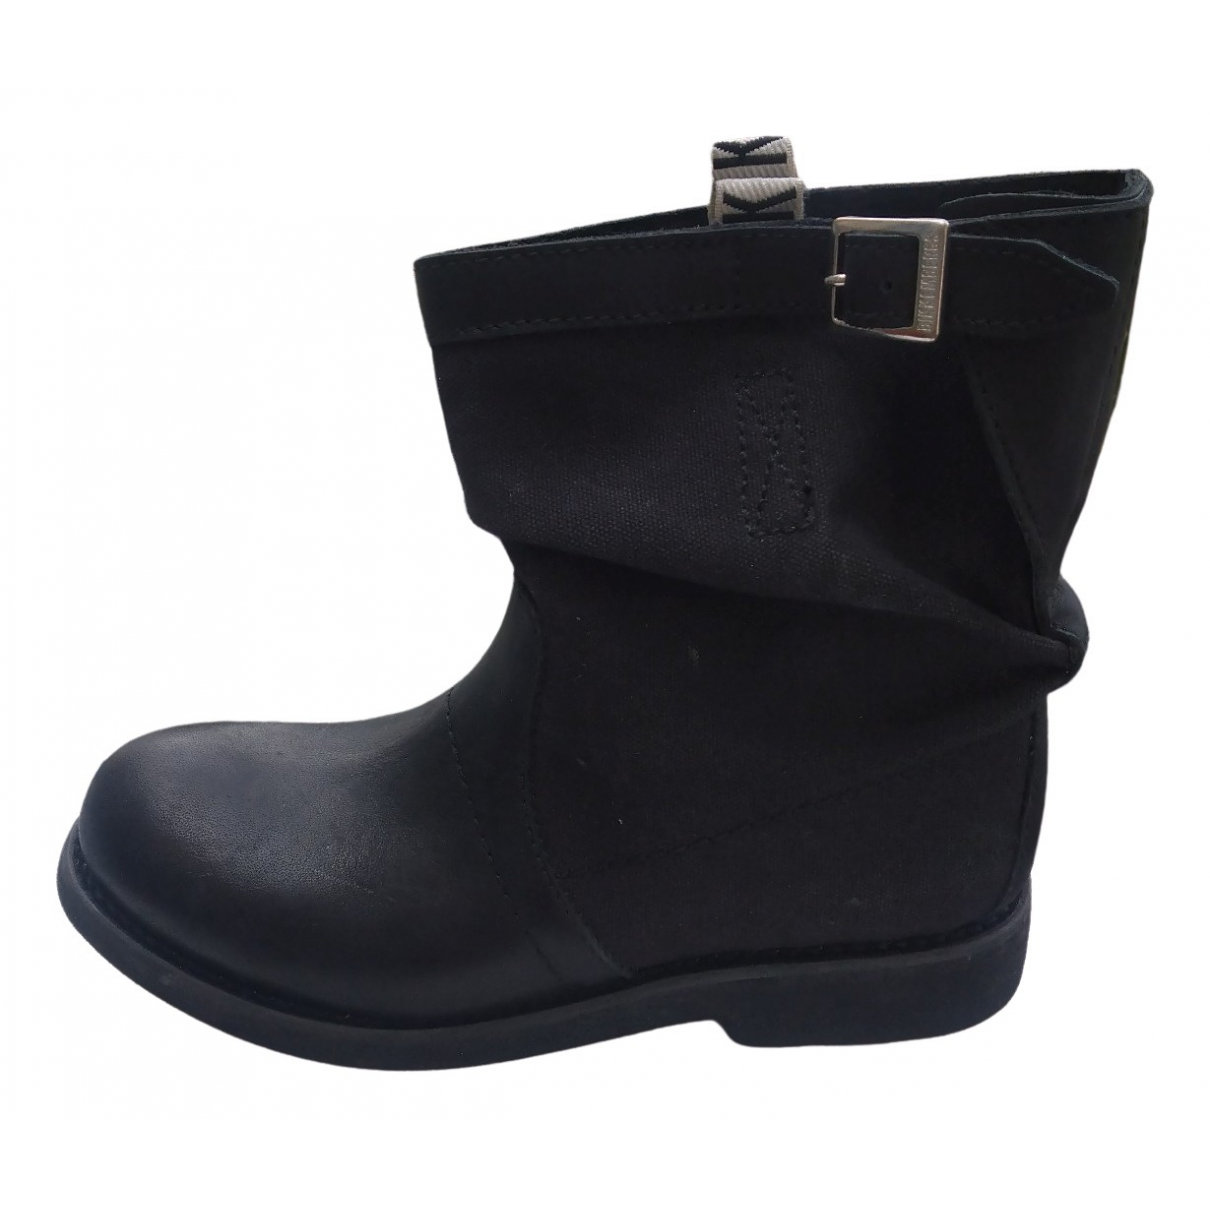 Dirk Bikkembergs \N Black Leather Boots for Women 38 EU